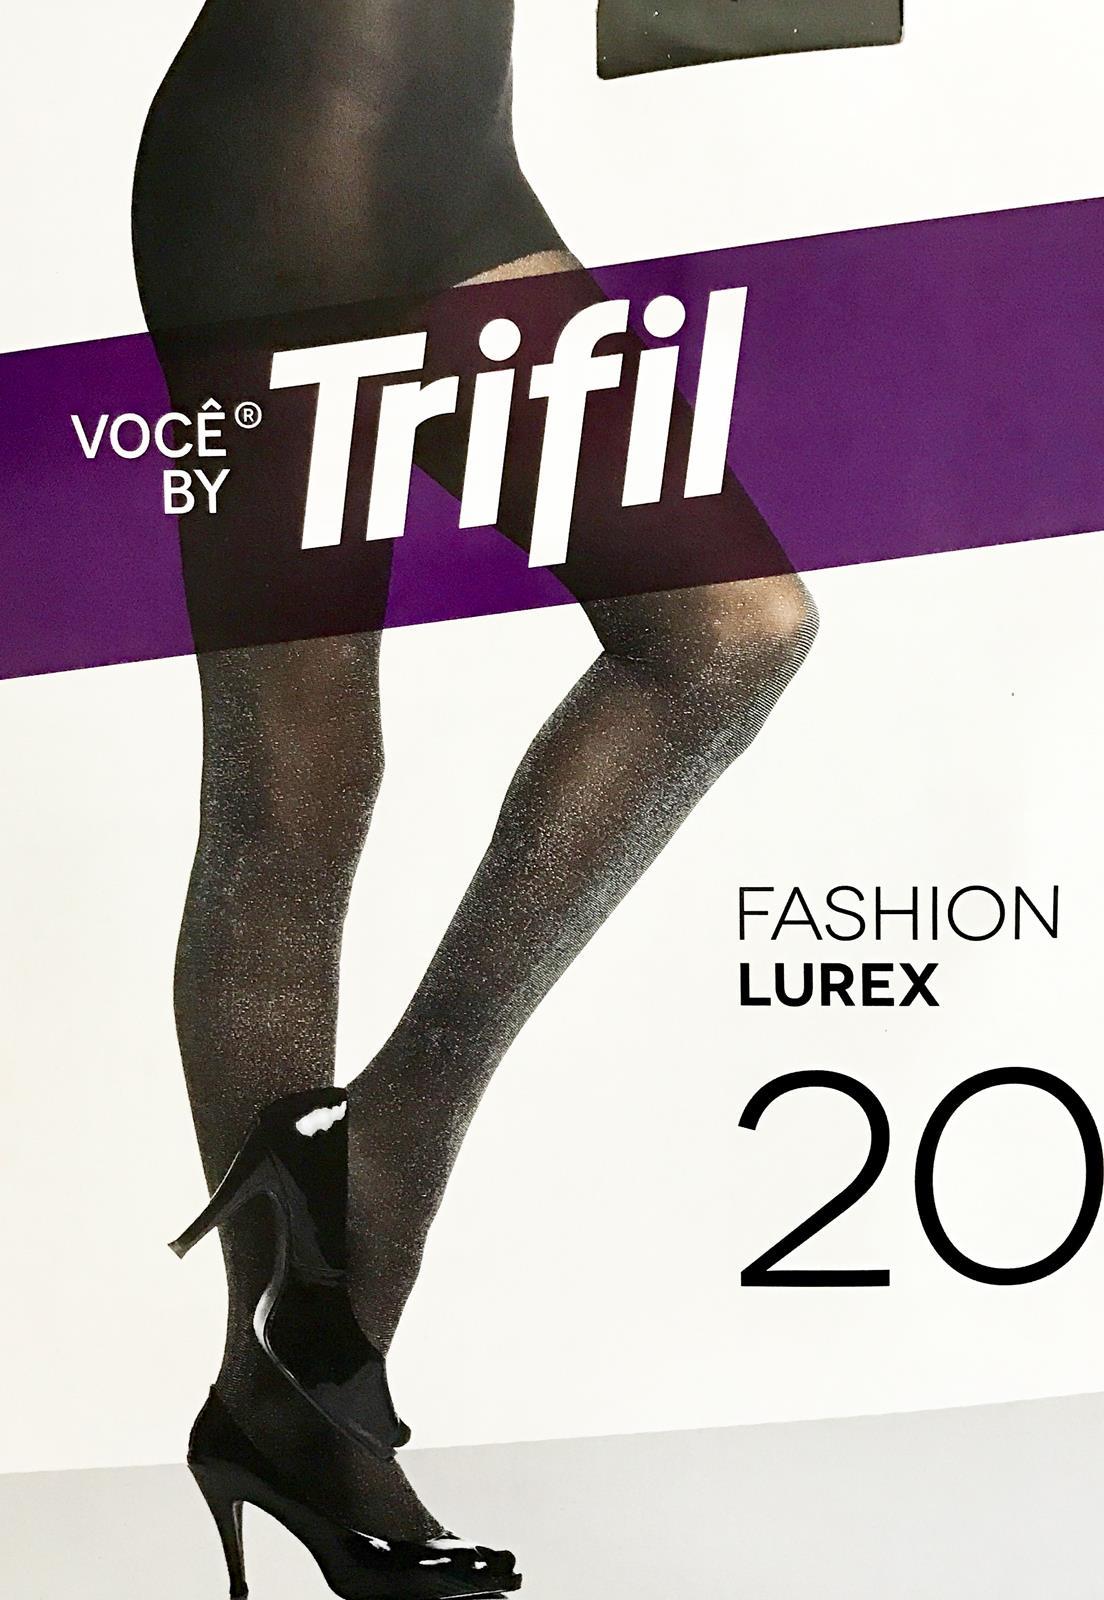 61c7eba5b Meia Calça Fashion Lurex Fio 20 Trifil 6176